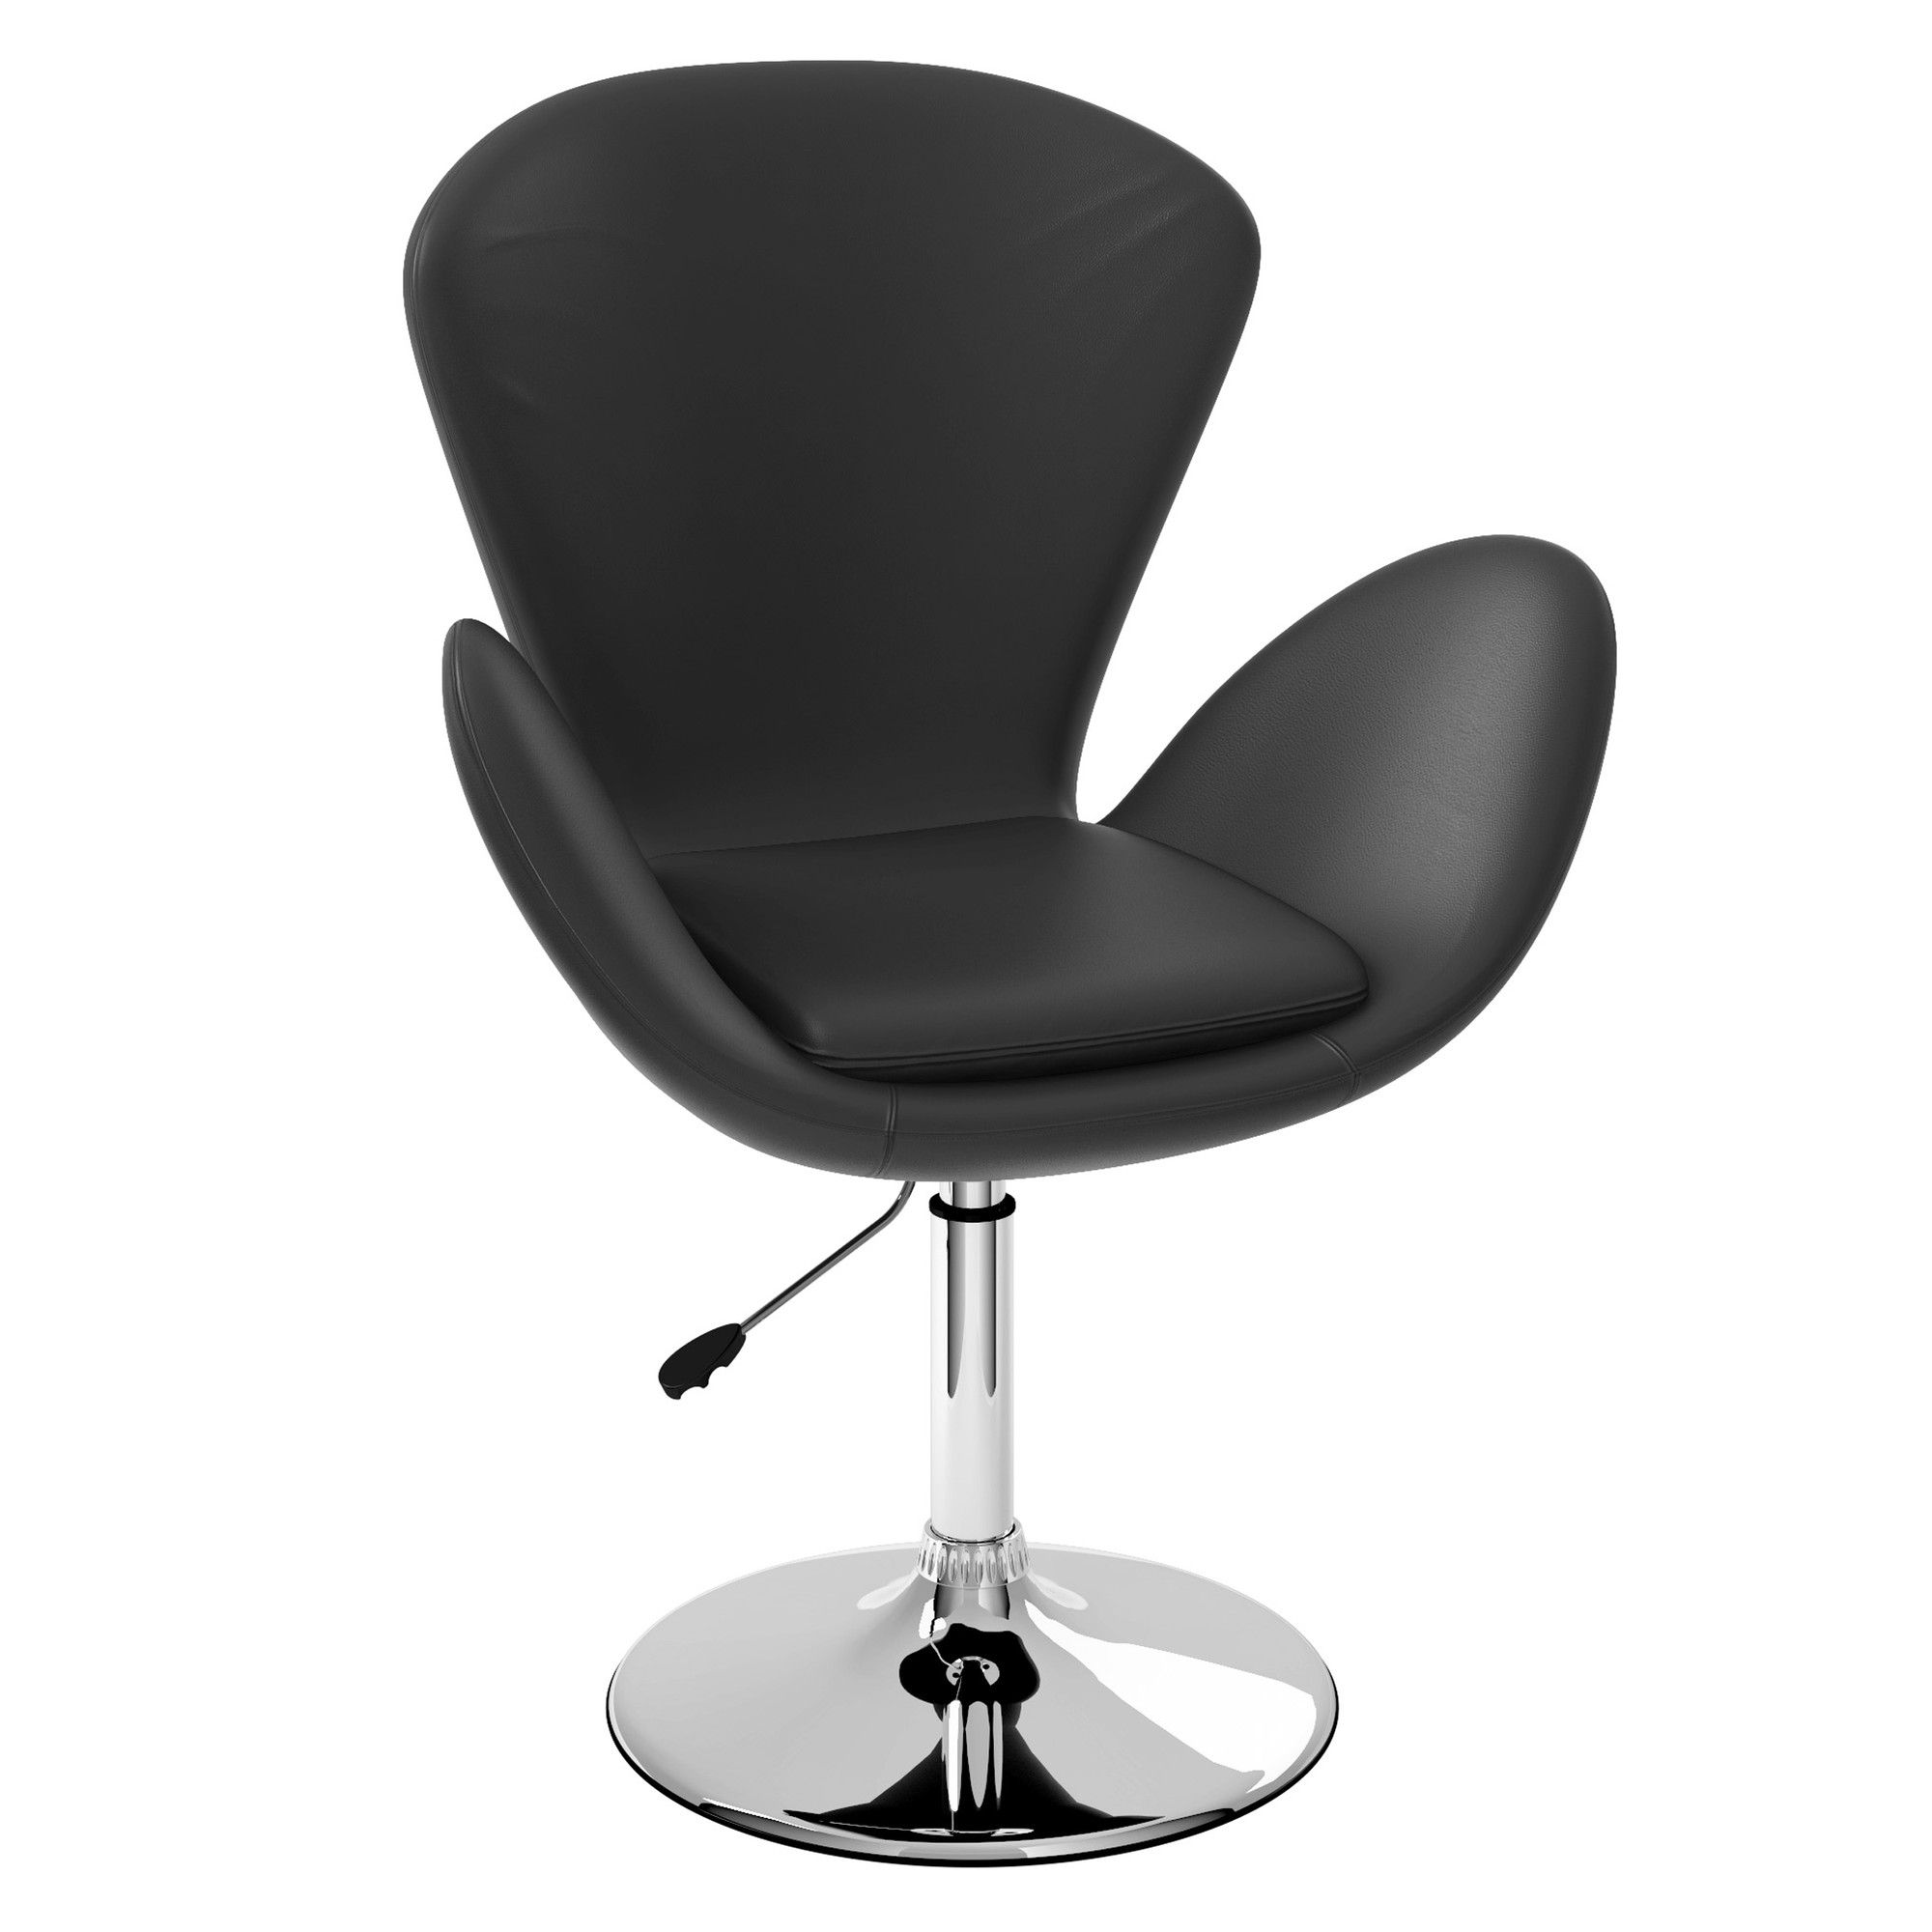 Astonishing Abrosia Adjustable Petal Arm Chair Wayfair Cjindustries Chair Design For Home Cjindustriesco